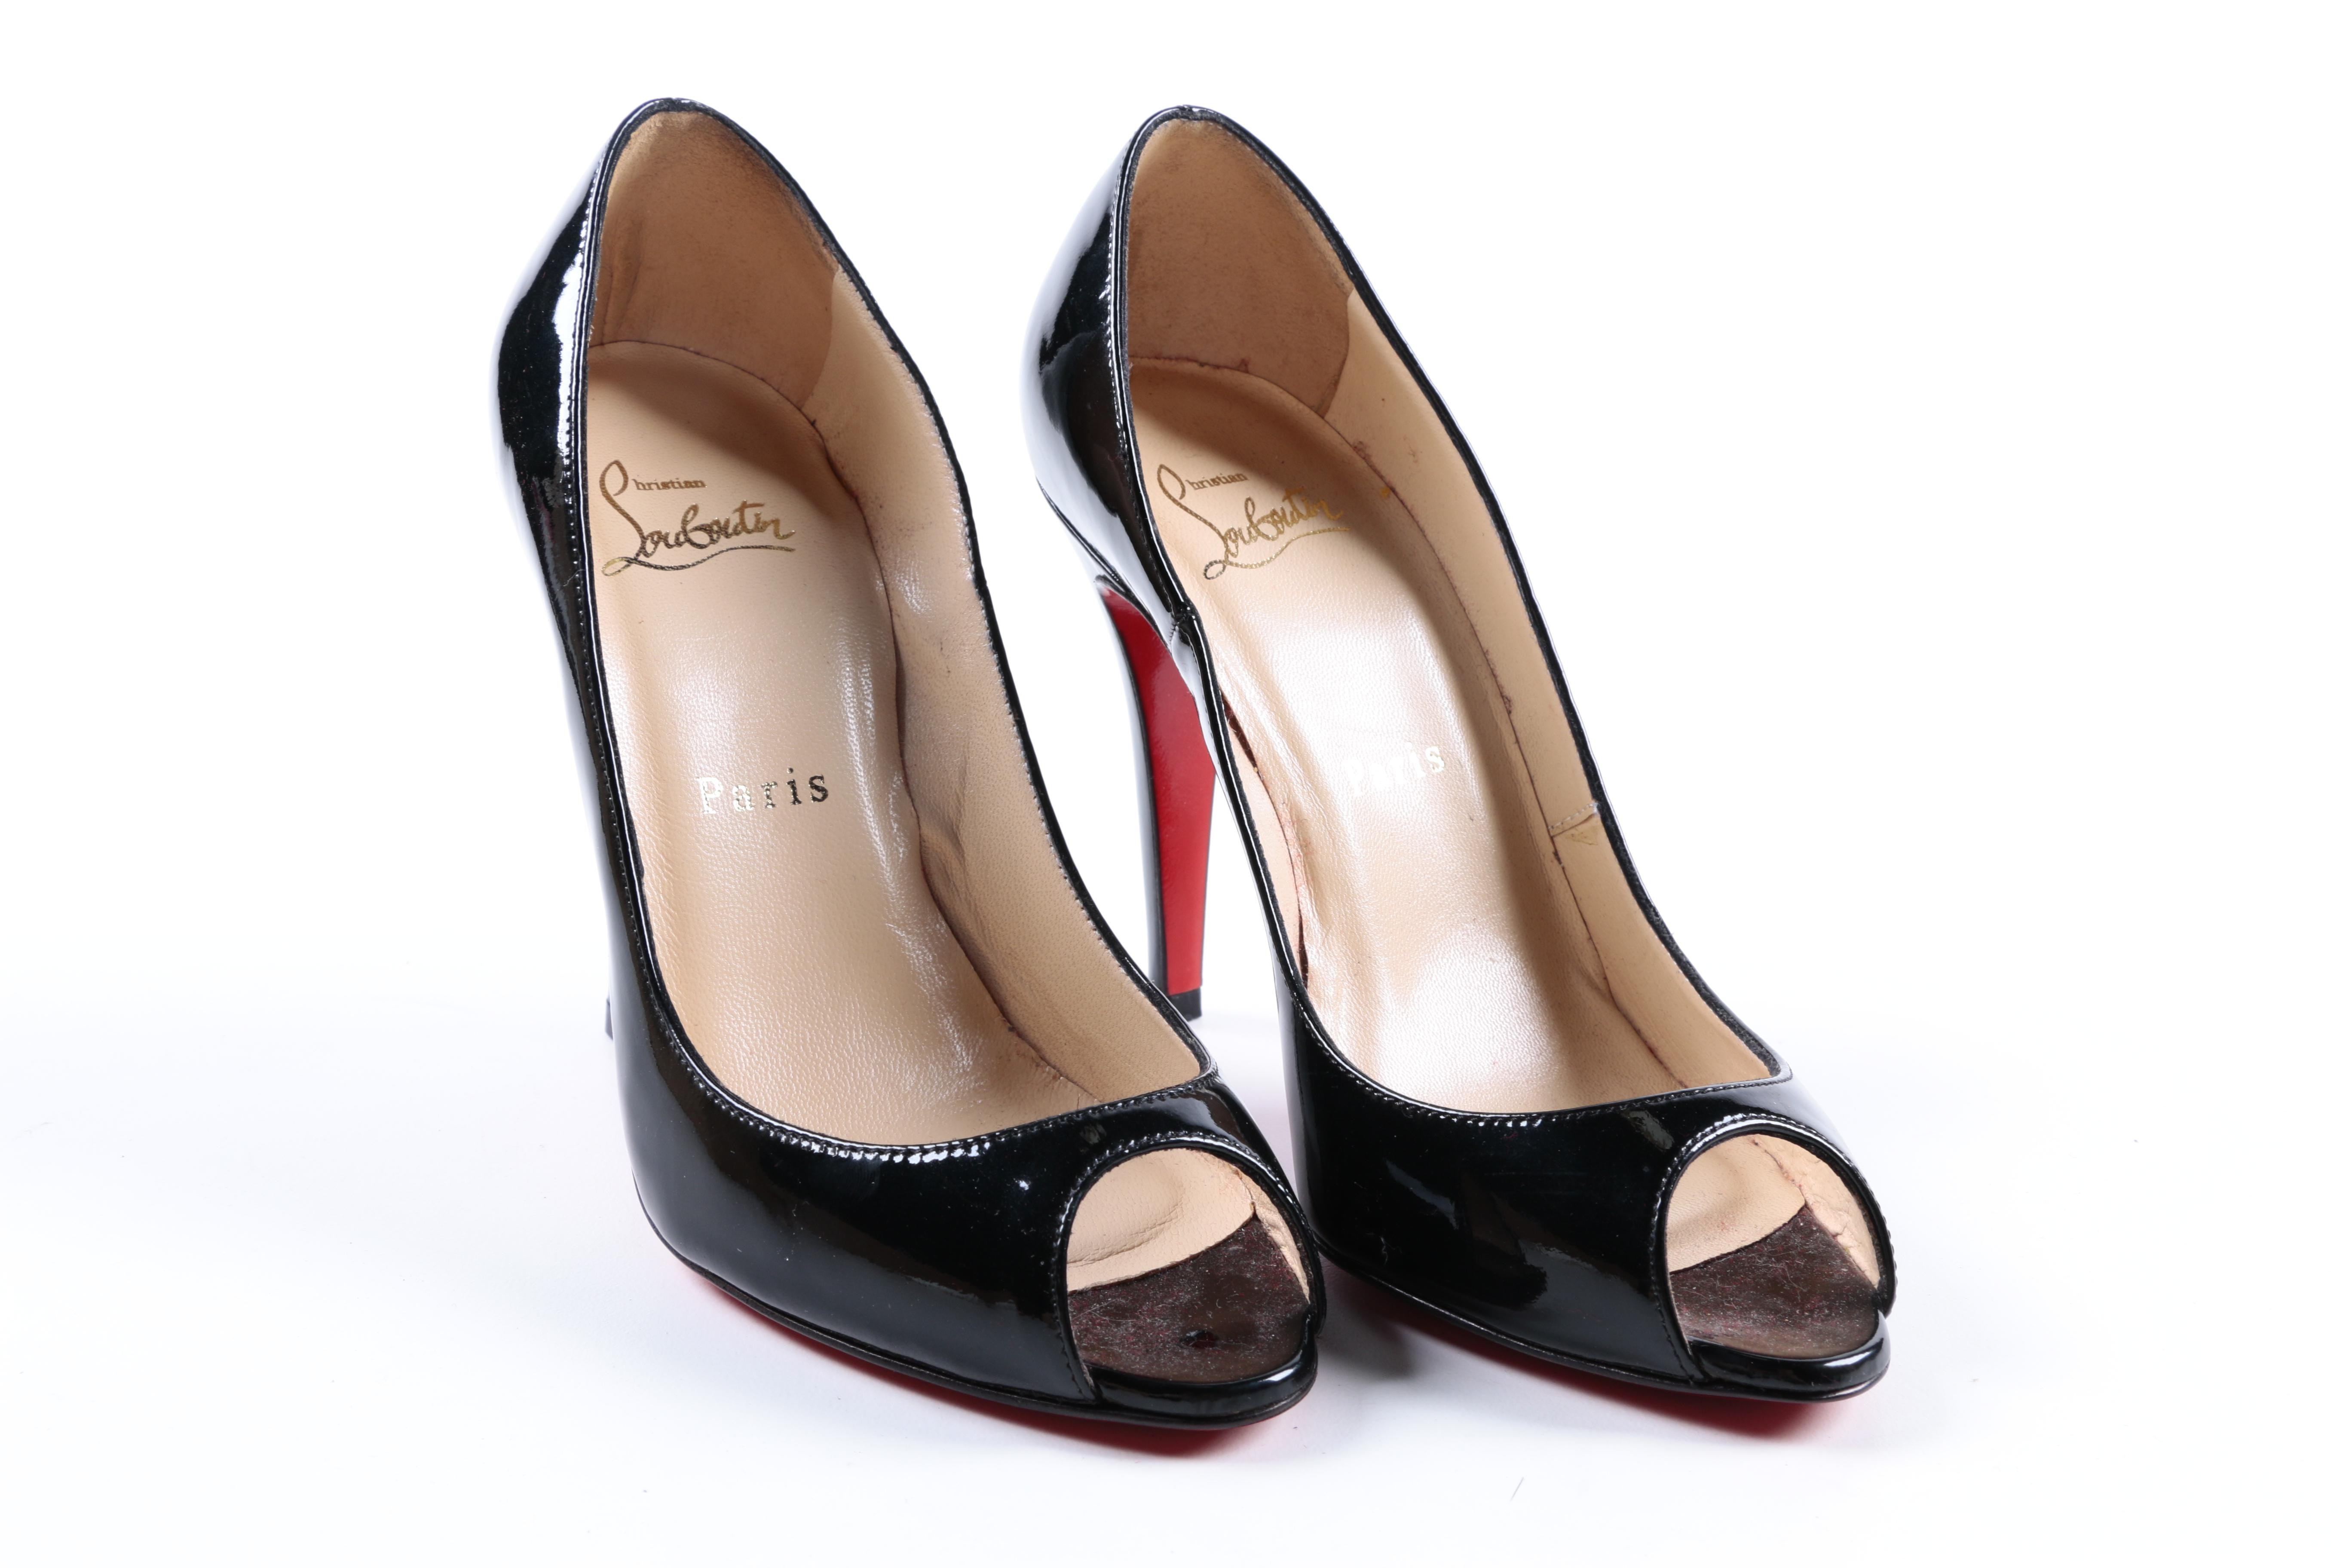 Christian Louboutin Patent Leather Peep Toe Pumps